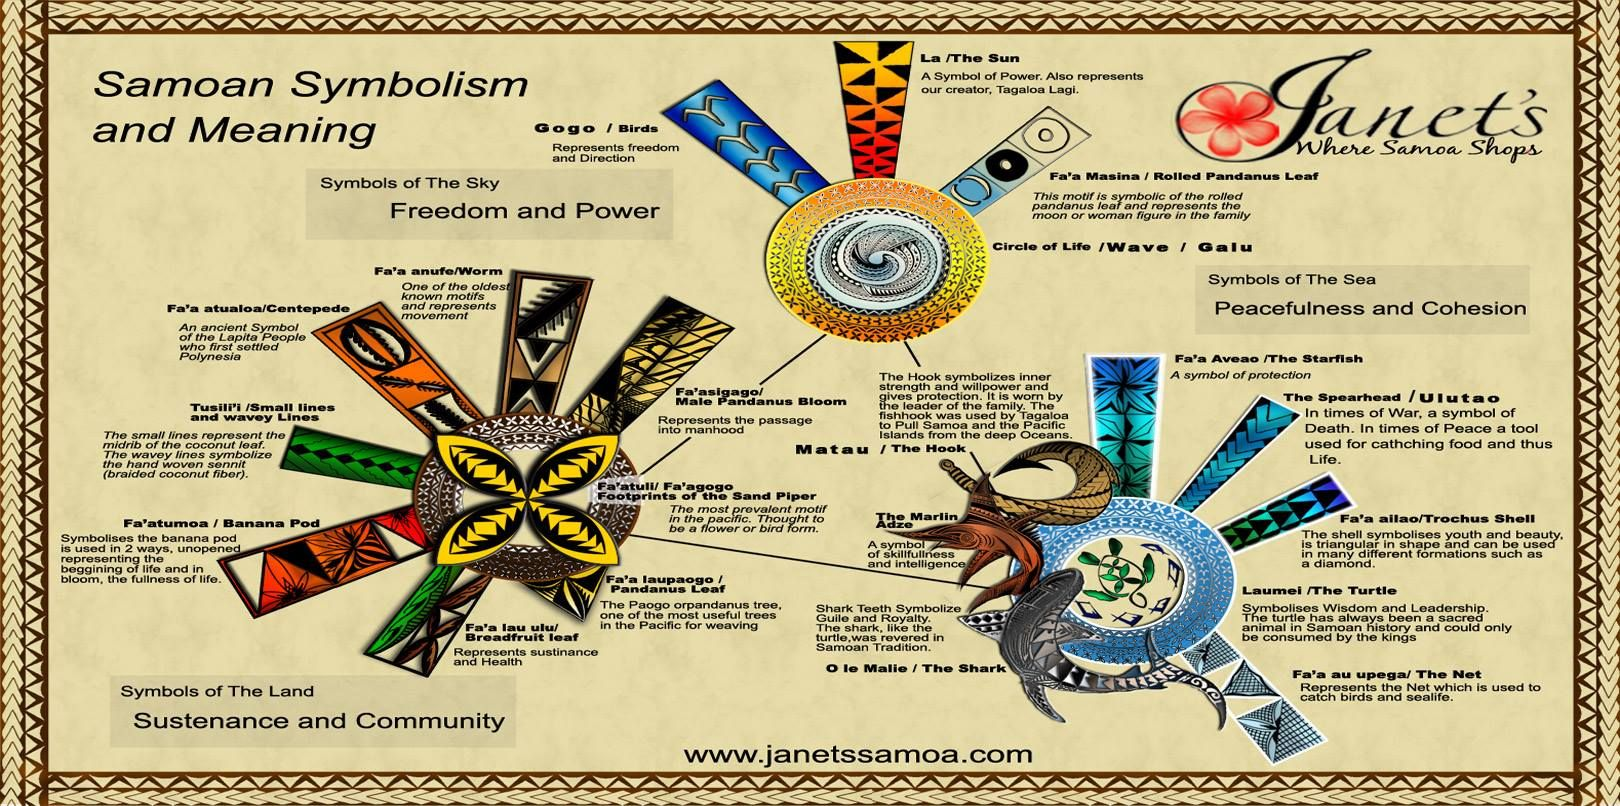 Samoan tribal tattoo meaning tattoos pinterest samoan tribal samoan tribal tattoo meaning biocorpaavc Gallery